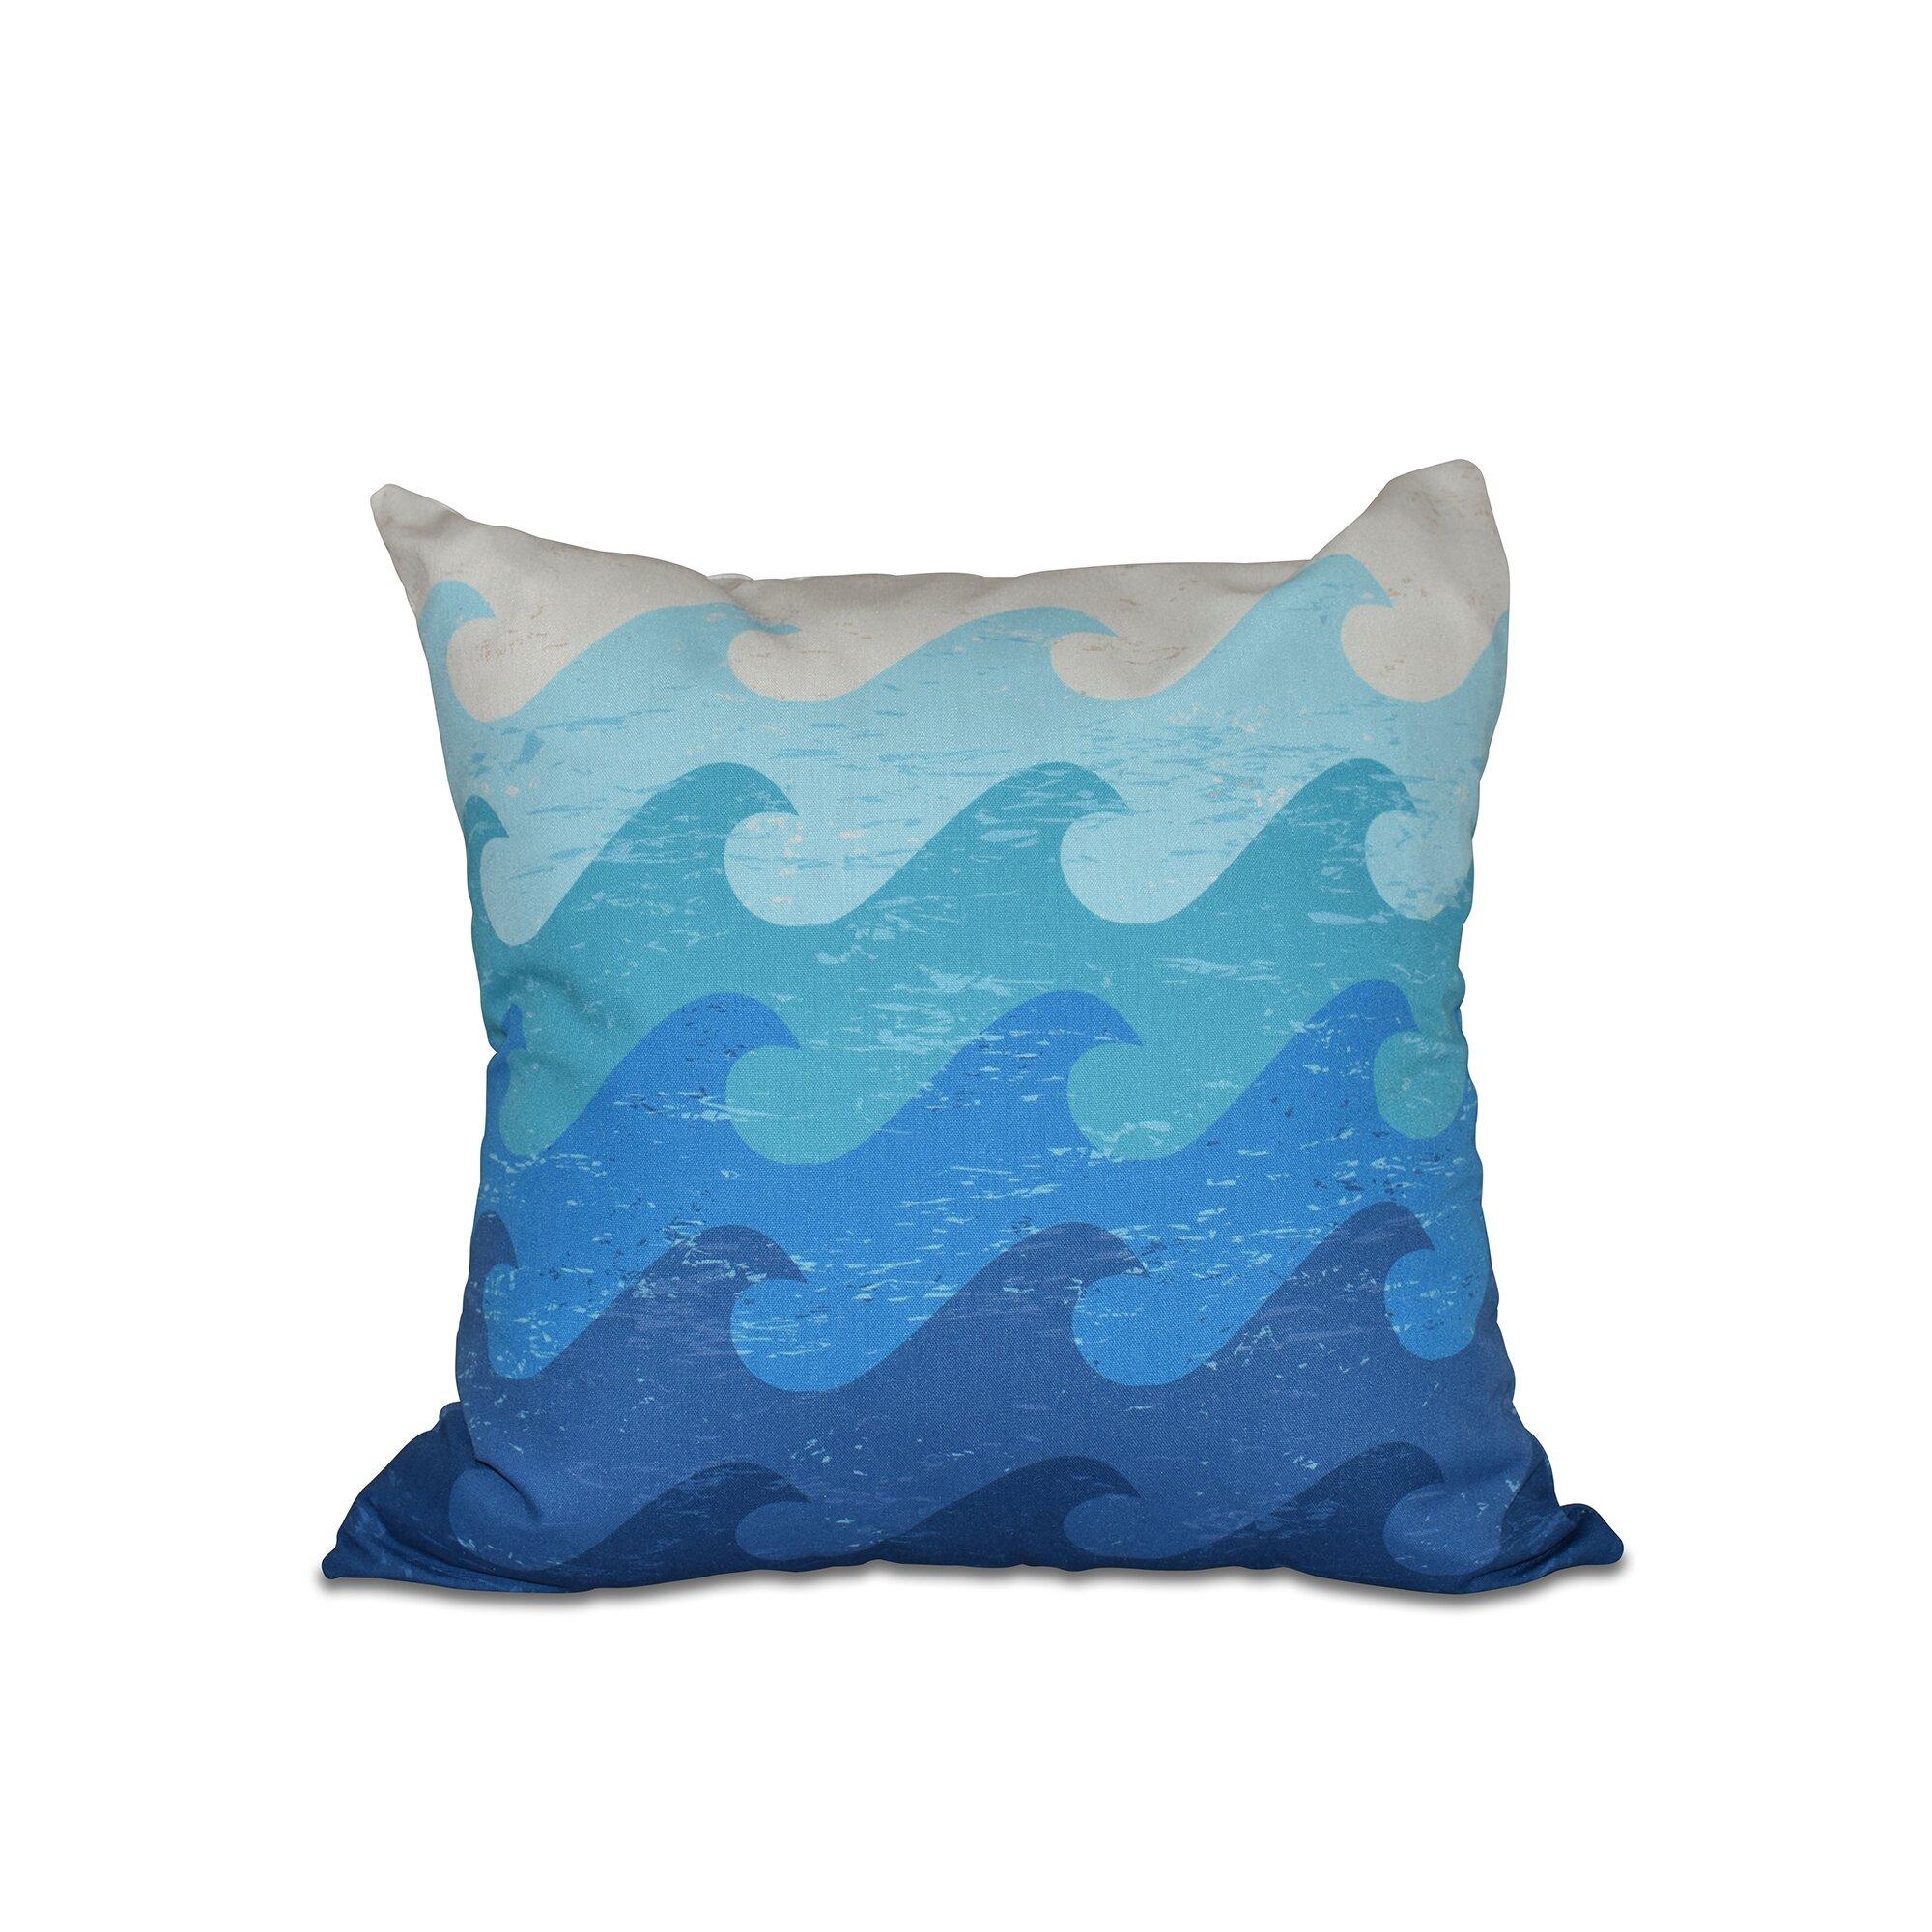 Outdoor Beach Throw Pillows : Bay Isle Home Golden Beach Deep Sea Geometric Outdoor Throw Pillow & Reviews Wayfair